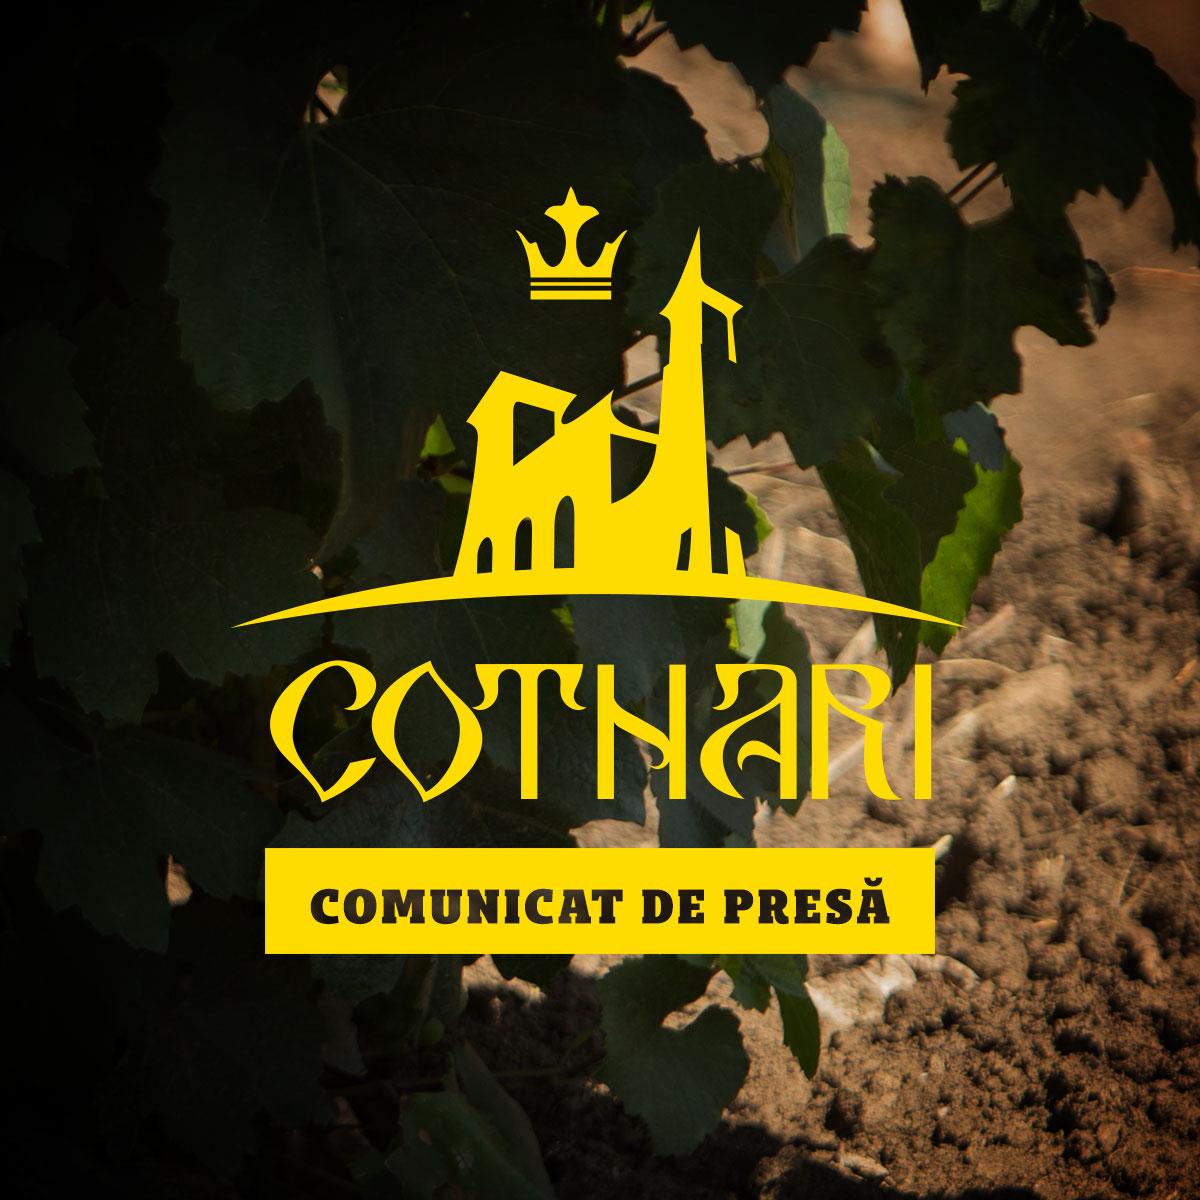 https://www.cotnari.ro/continut/uploads/2017/08/comunicat24.jpg